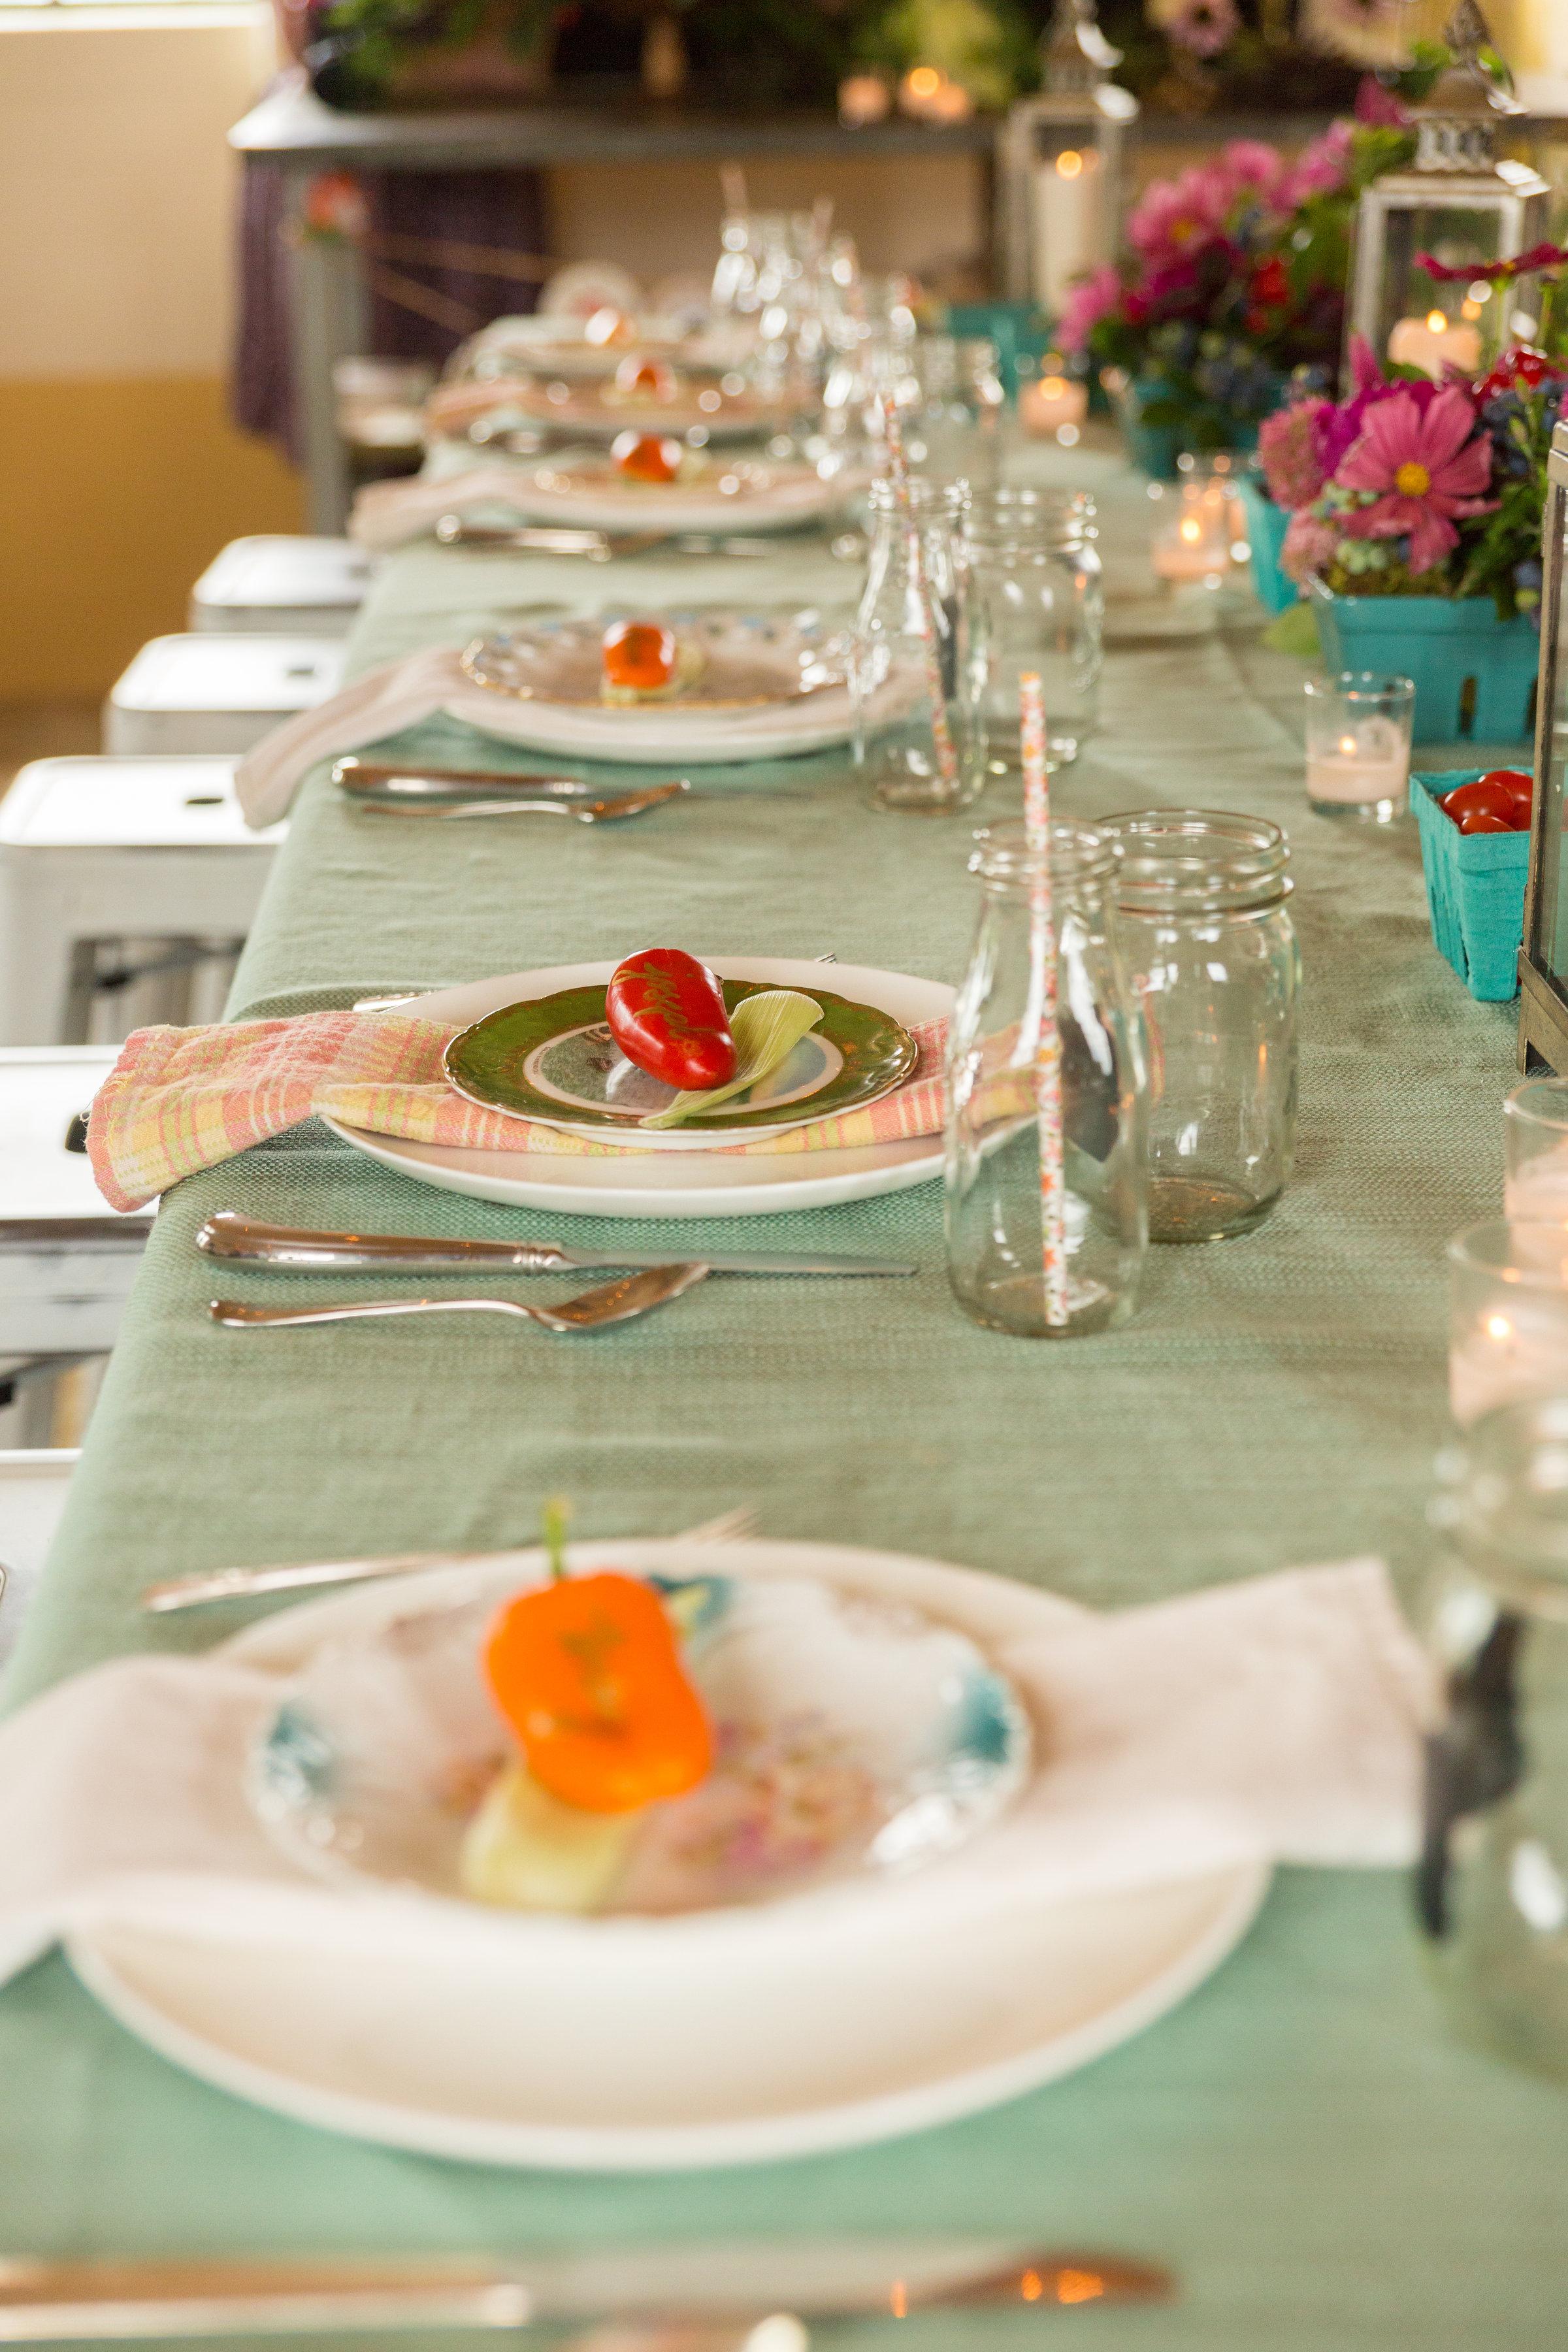 Danielle-Jeff-Farm-to-table-wedding-photography-love-story-studios-0014.jpg